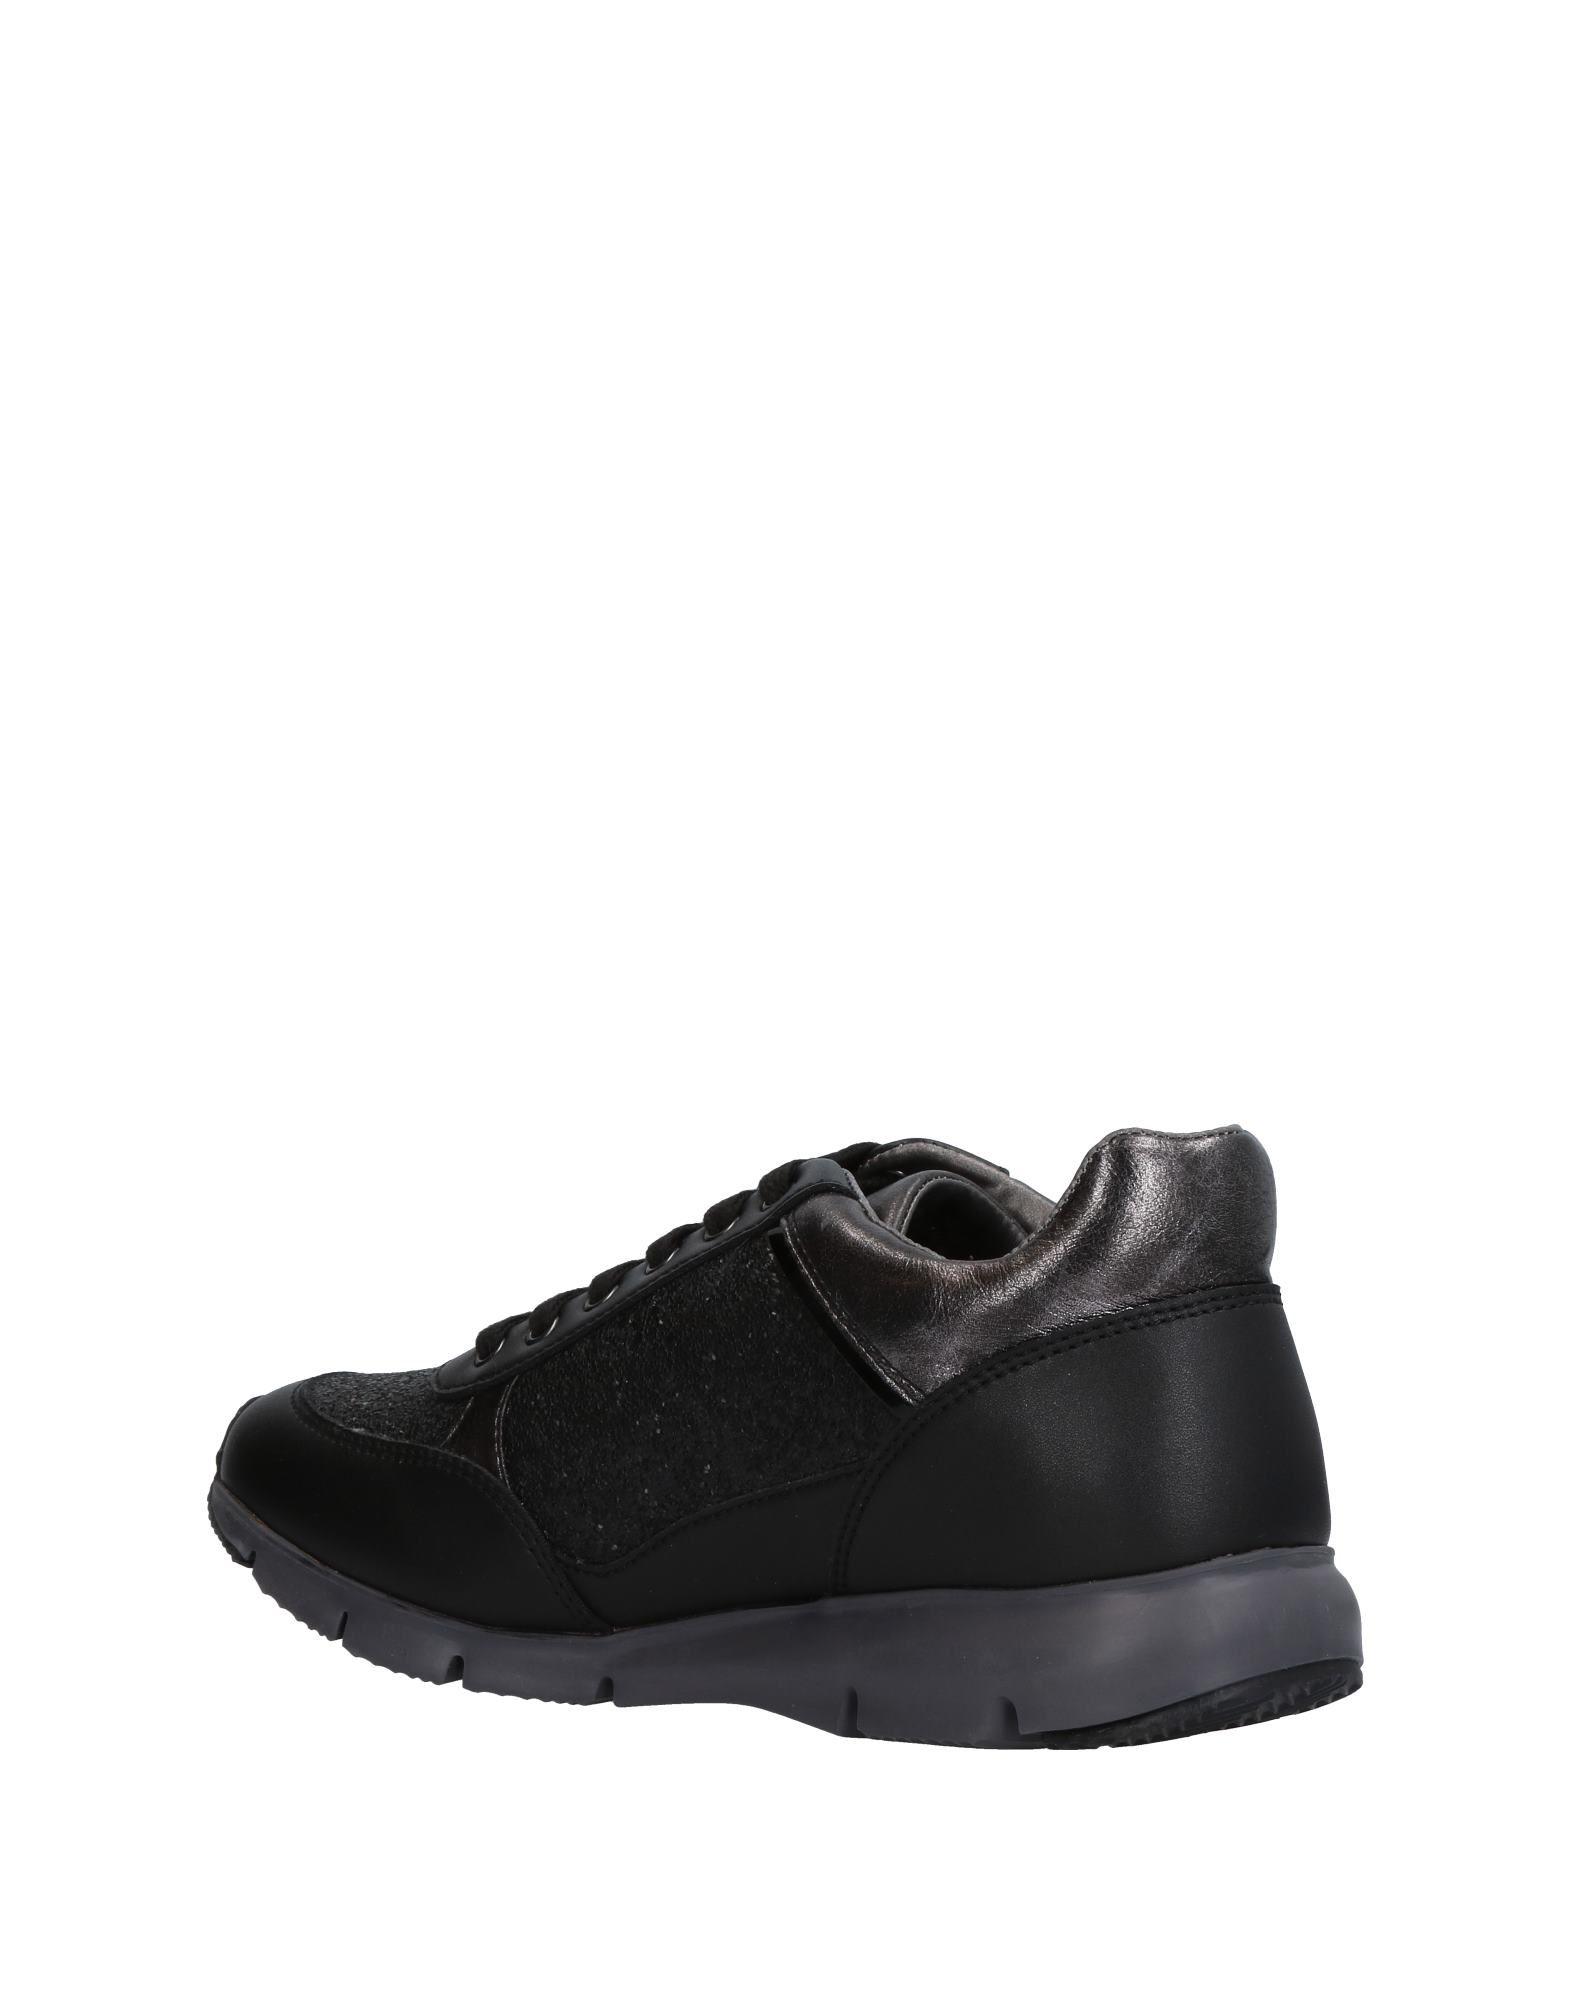 Lumberjack Sneakers 11337397SP Damen  11337397SP Sneakers Gute Qualität beliebte Schuhe 8a6f84